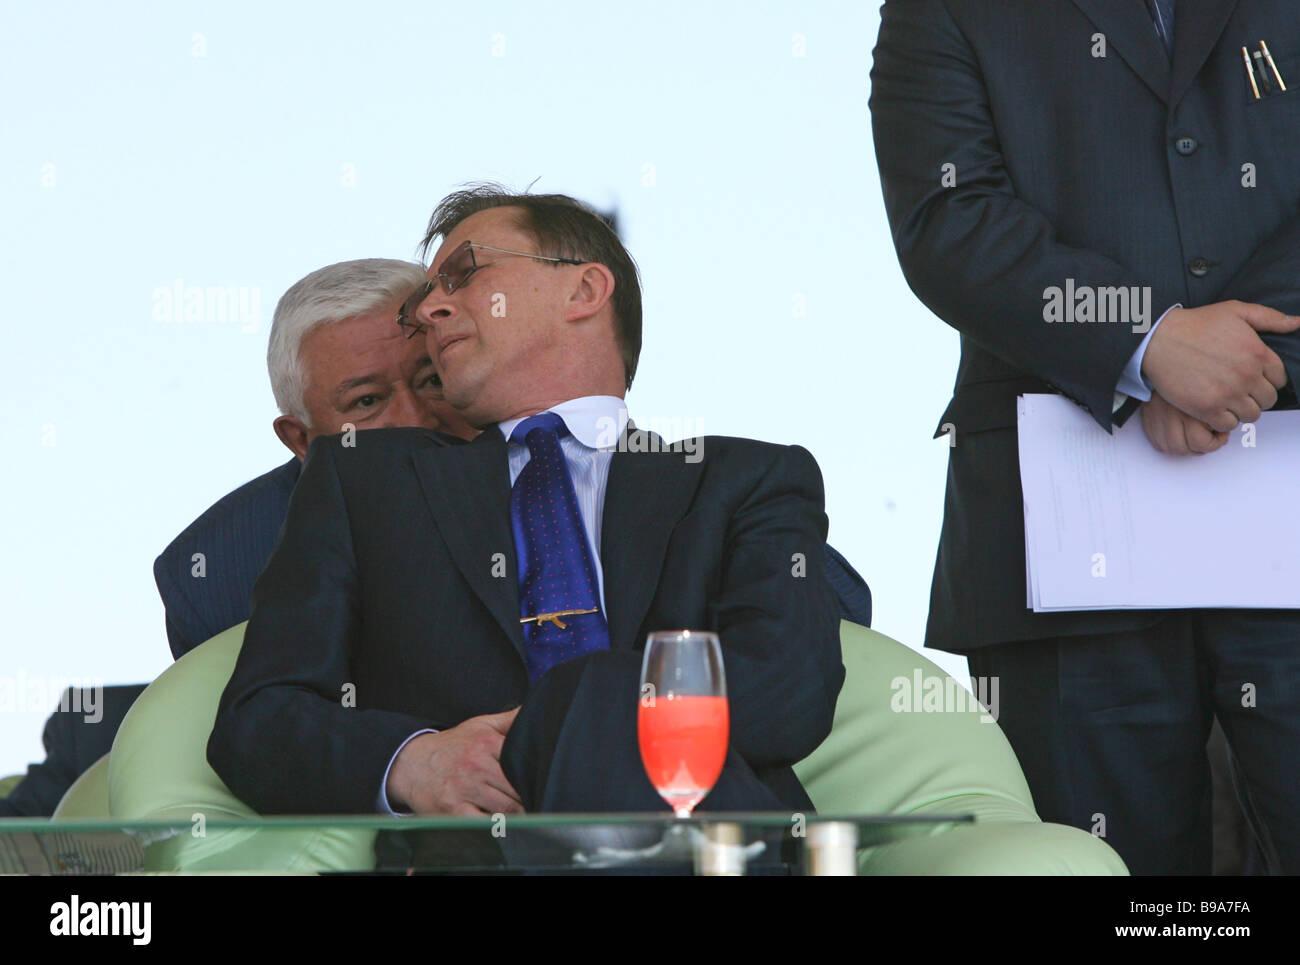 Russia s Defense Minister Sergei Ivanov front row and Oleg Demchenko president of Irkut Corporation back row during - Stock Image